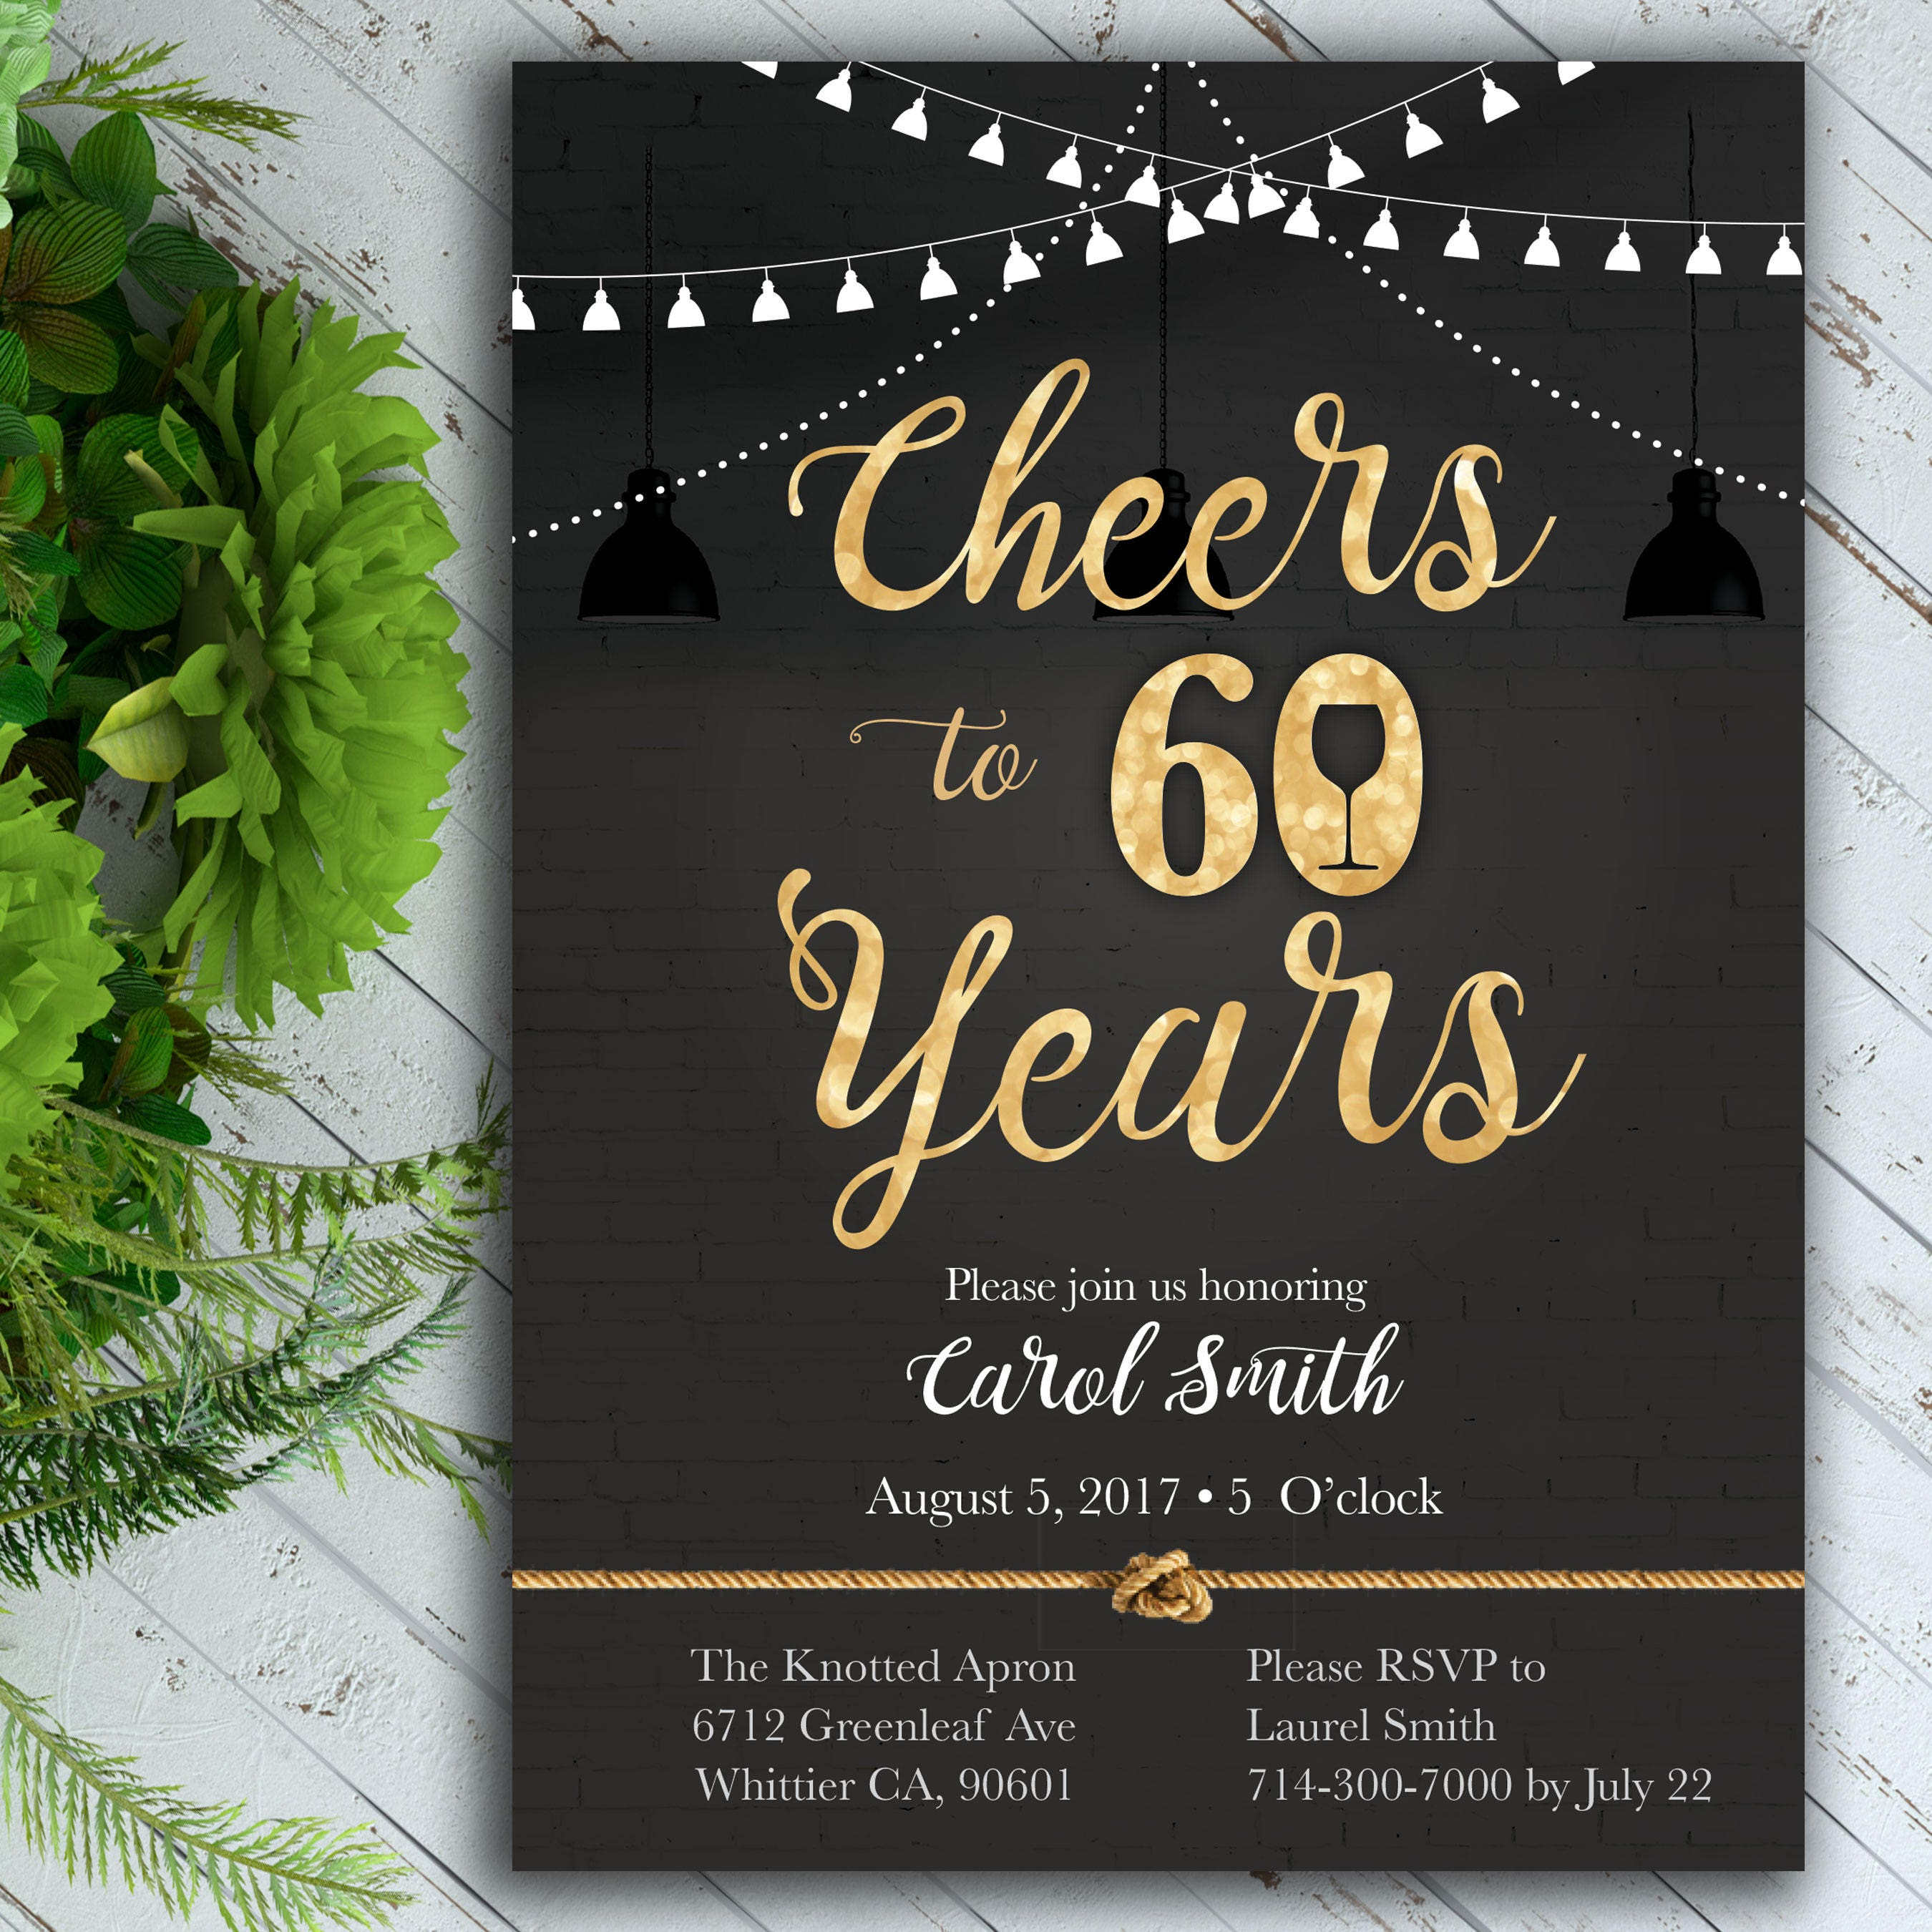 Cheers Birthday Invitation Classy Birthday Invitation 40th